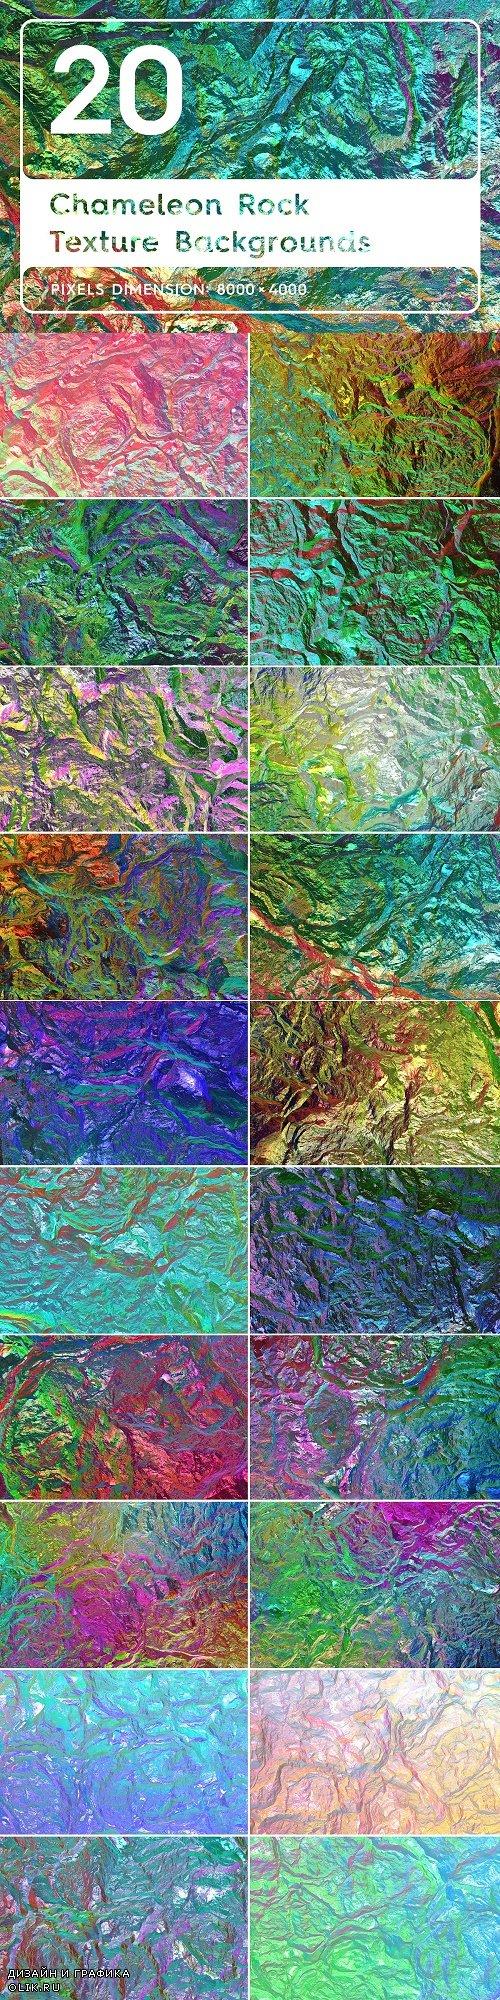 20 Chameleon Rock Texture Background - 3816847